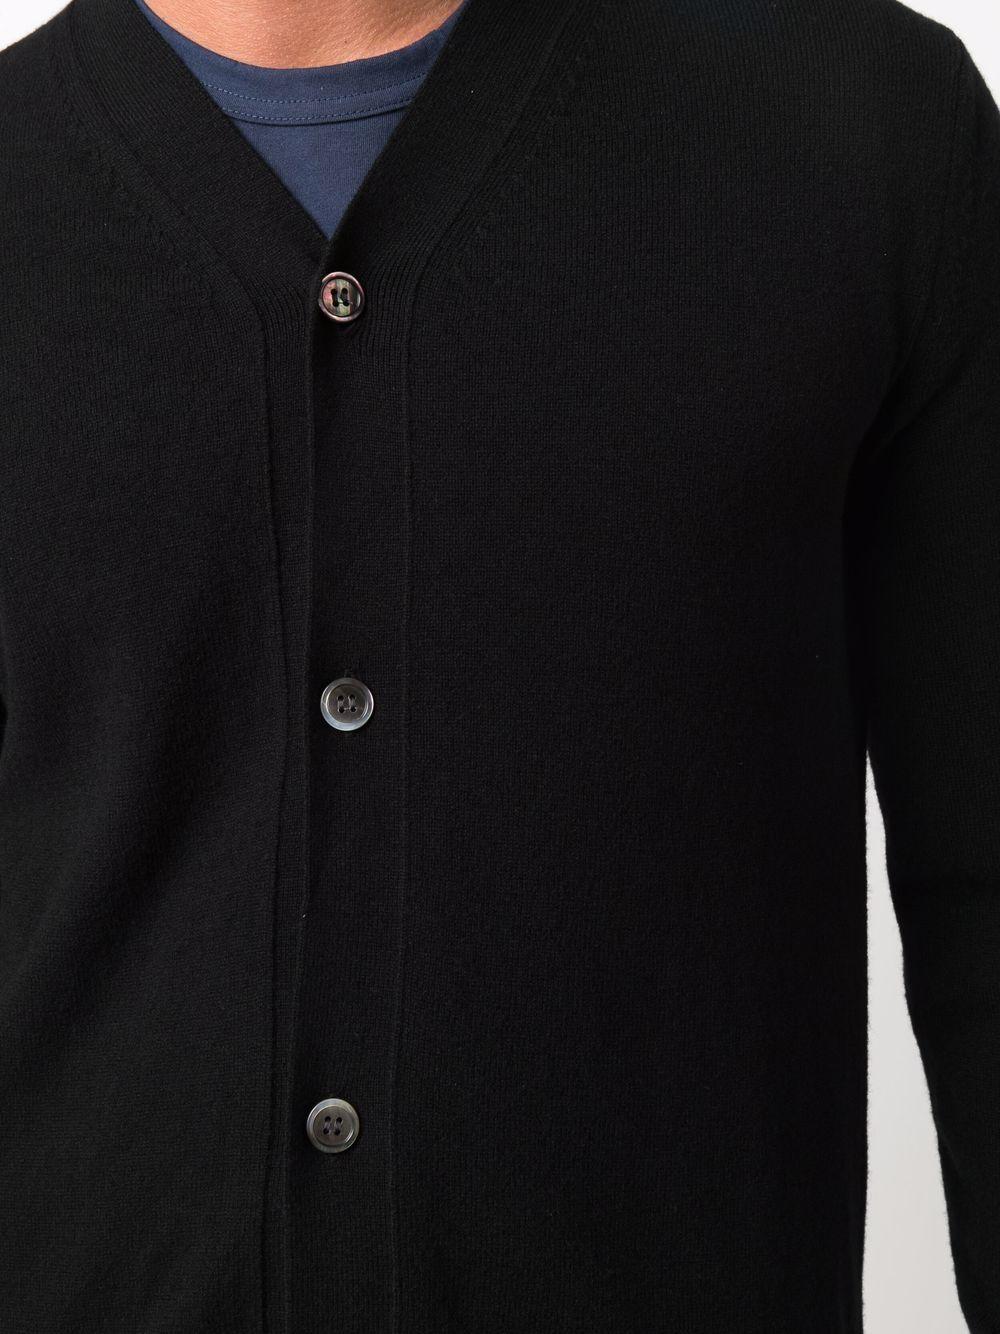 cardigan in lana uomo nero COMME DES GARÇONS SHIRT | Maglieria | FH-N001-W211